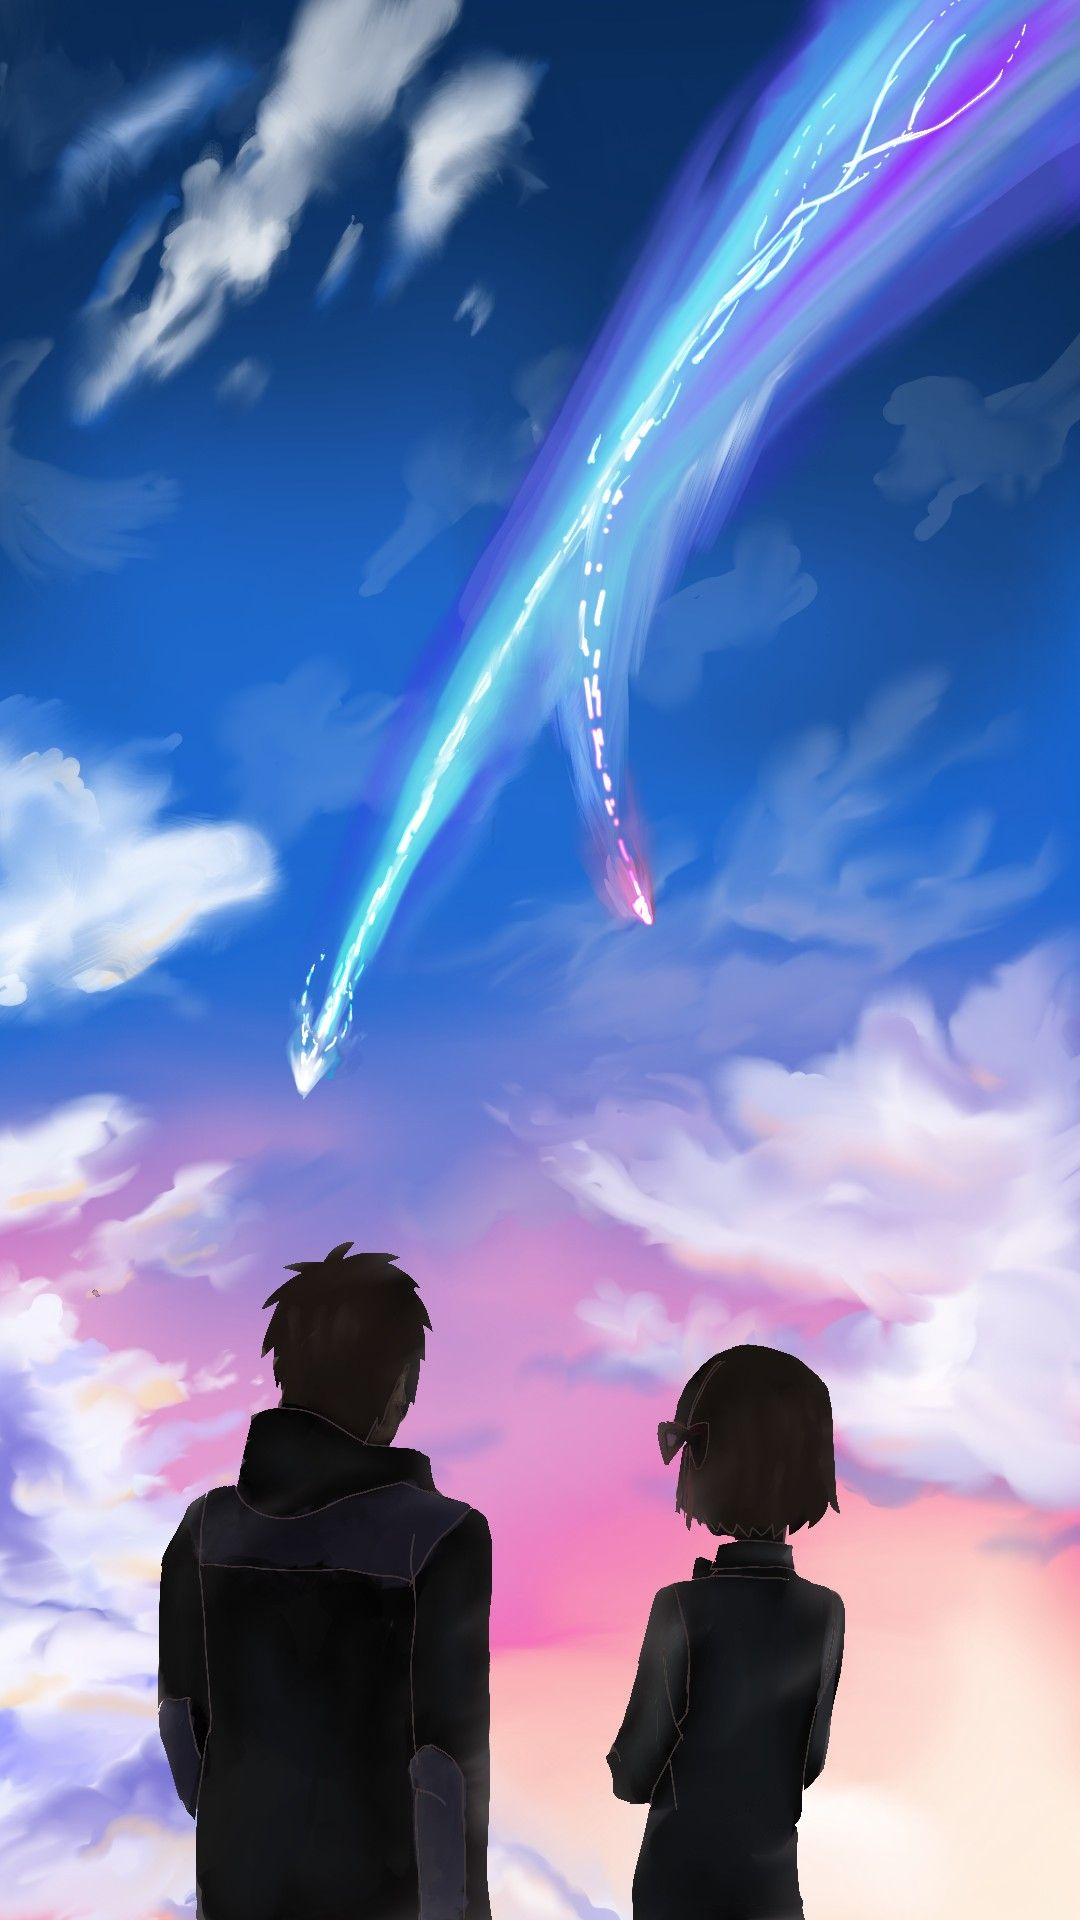 Kimi No Na Wa Your Name Fanart Your Name Anime Your Name Wallpaper Kimi No Na Wa